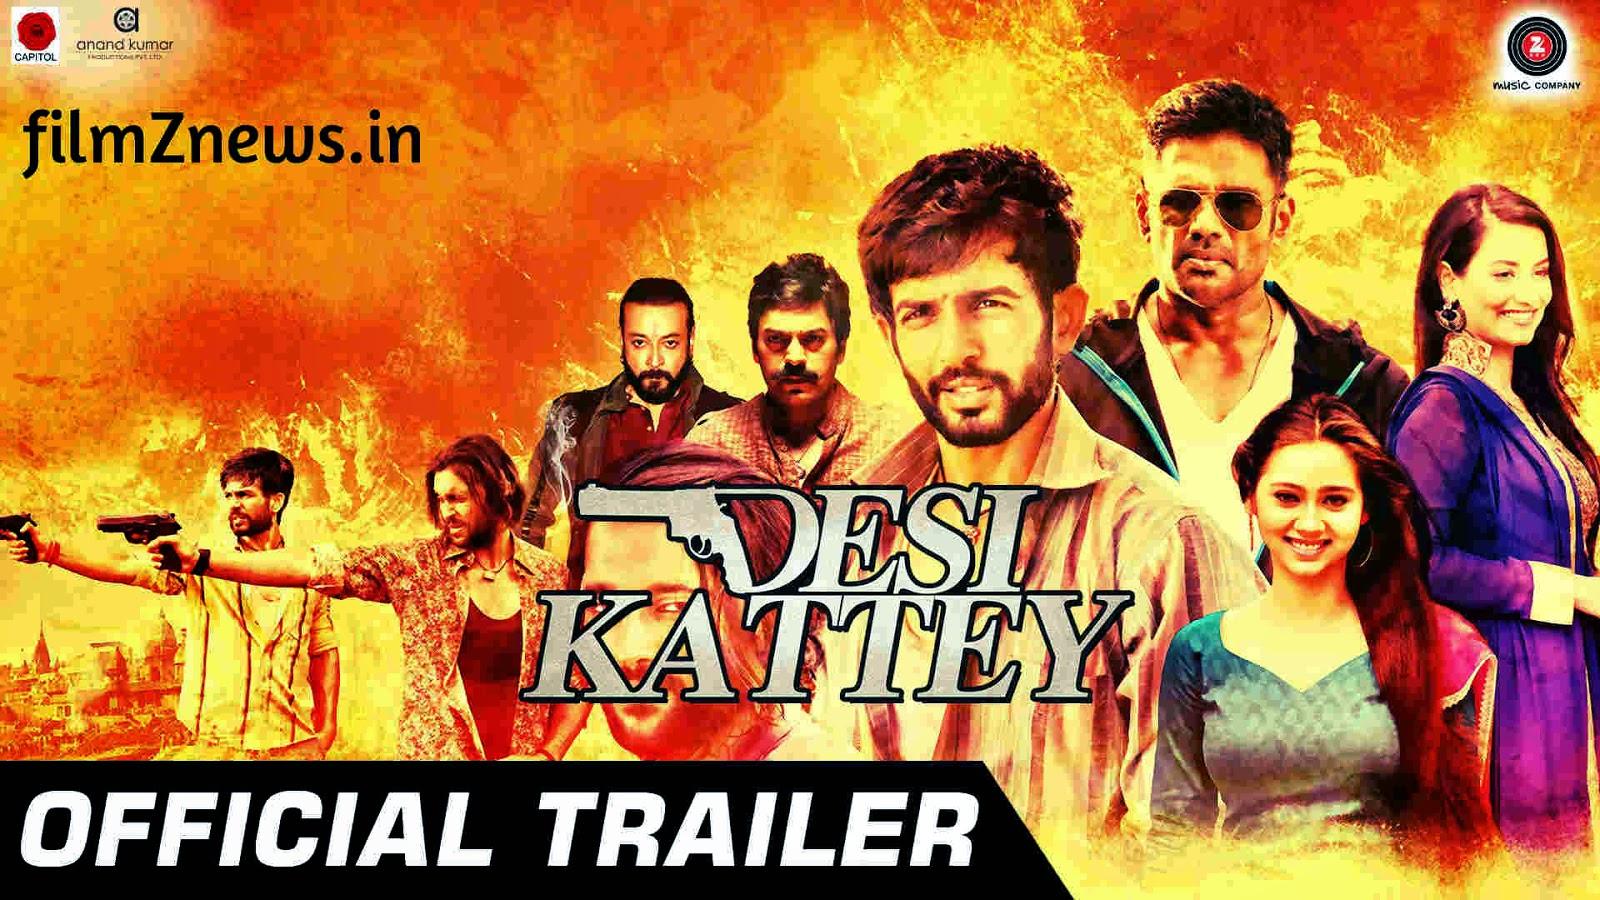 Desi Kattey (2014) Official Trailer Video - Suniel Shetty, Jay Bhanushali